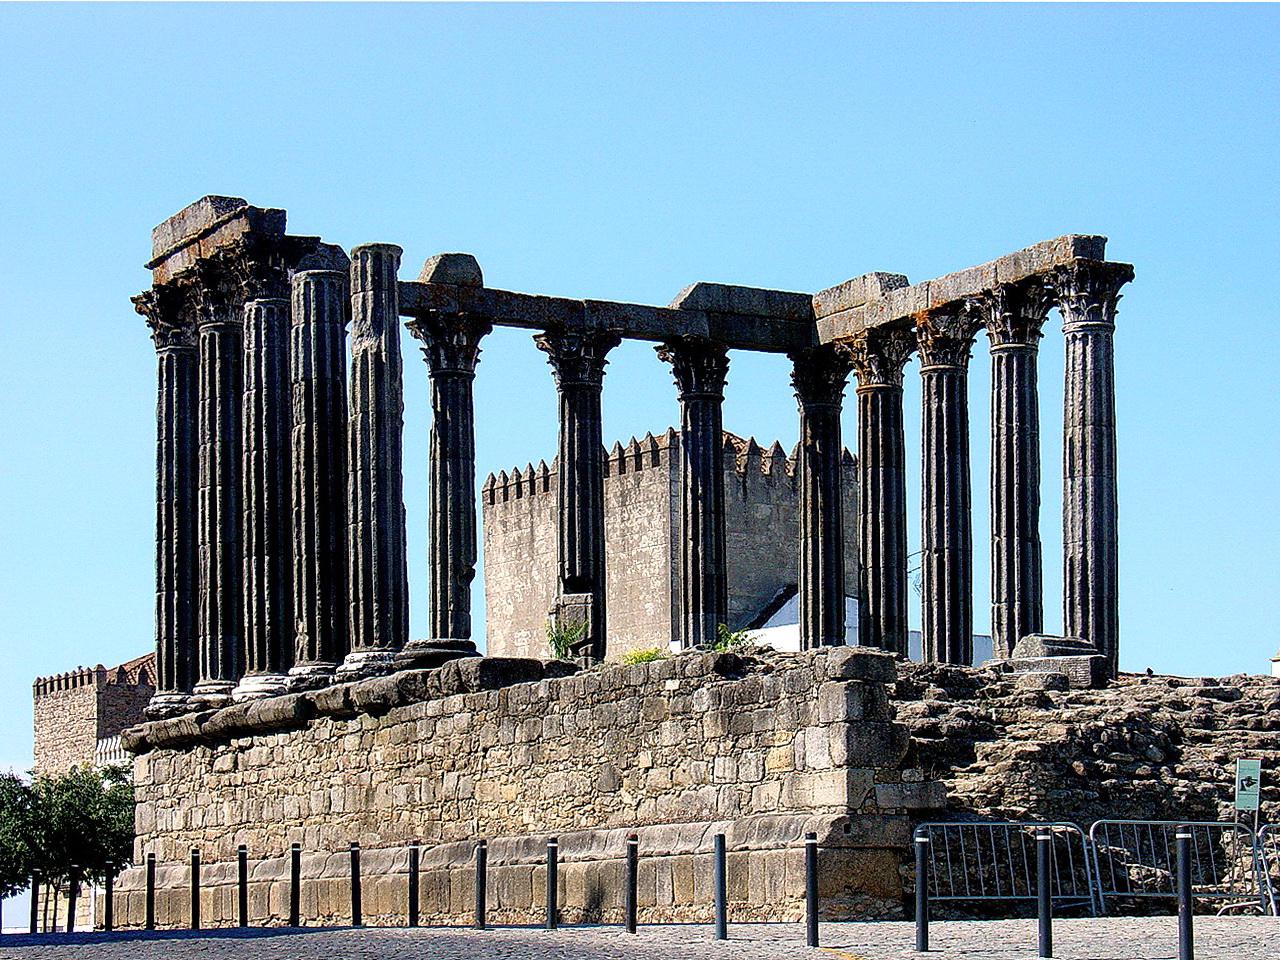 The Roman Temple of Évora